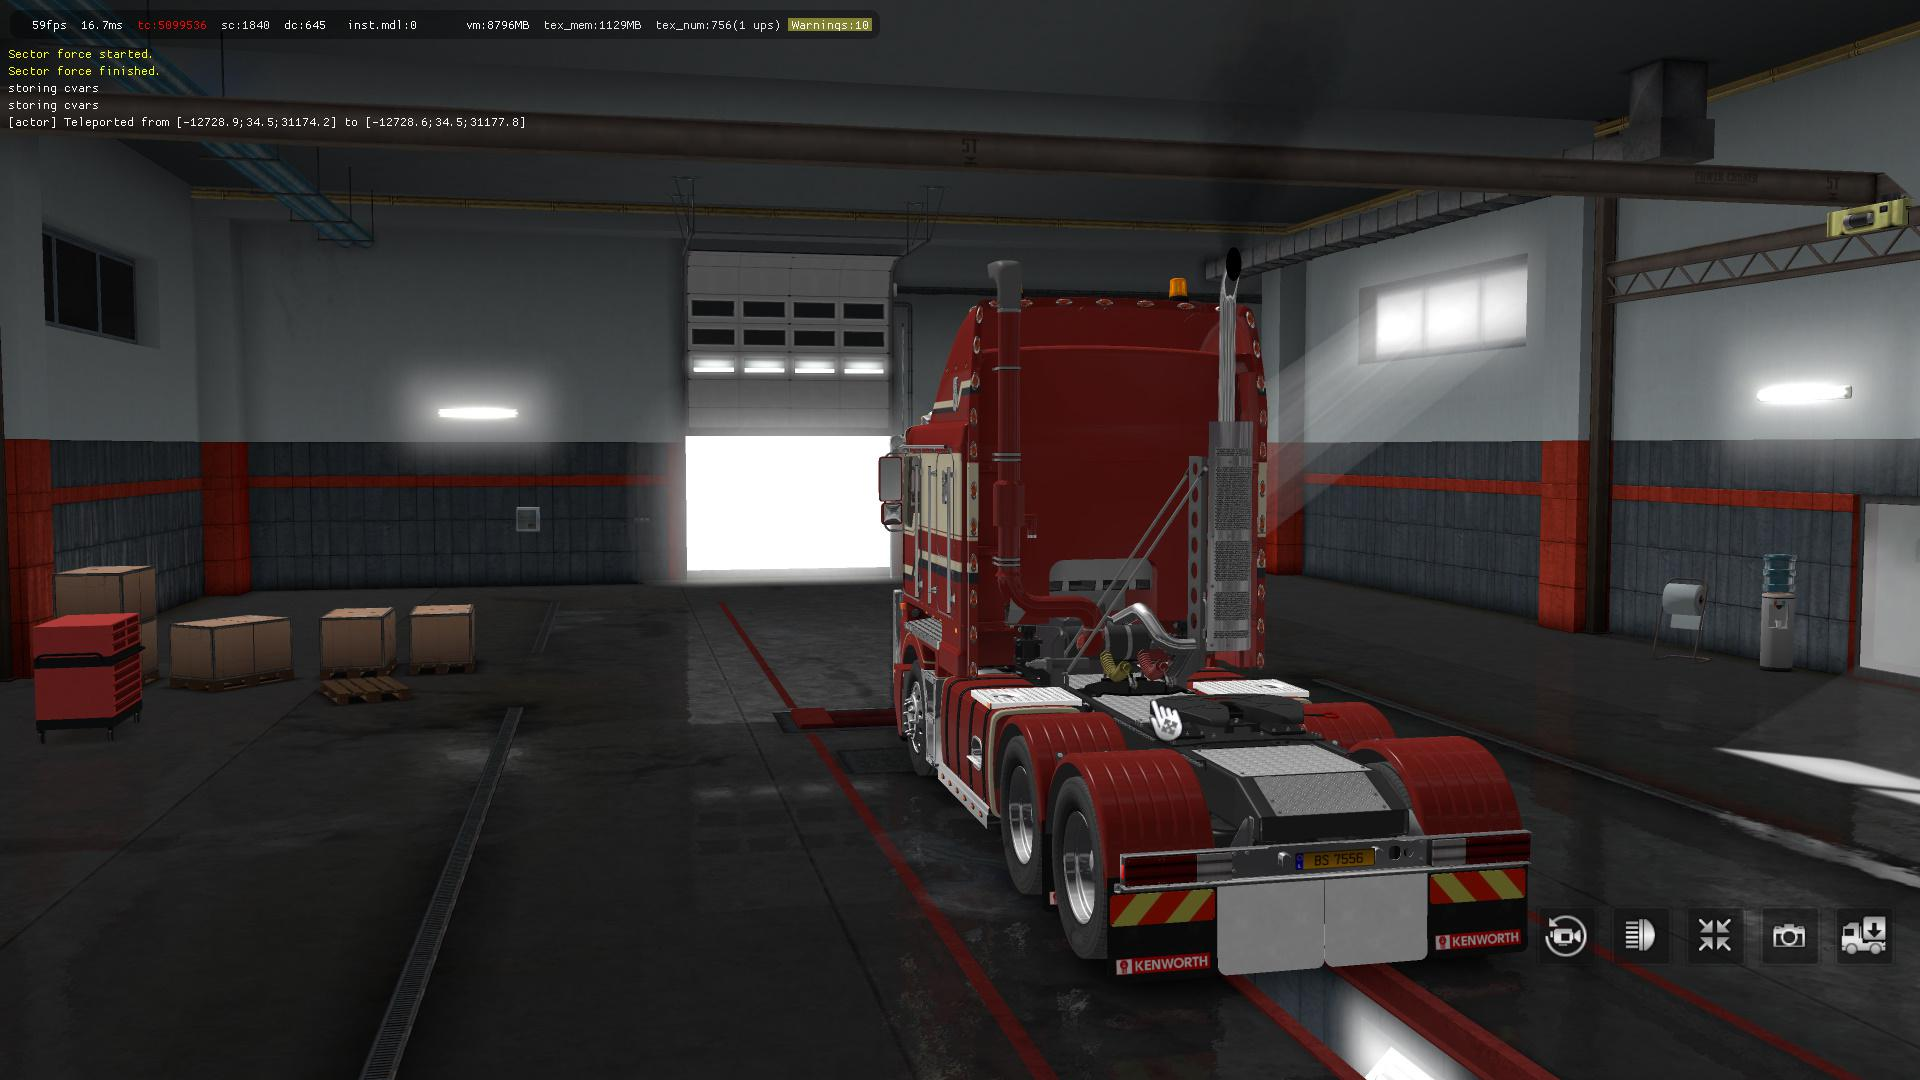 TRUCK KENWORTH ROAD 8X6 SIMULATOR TRAIN T800 EURO TÉLÉCHARGER